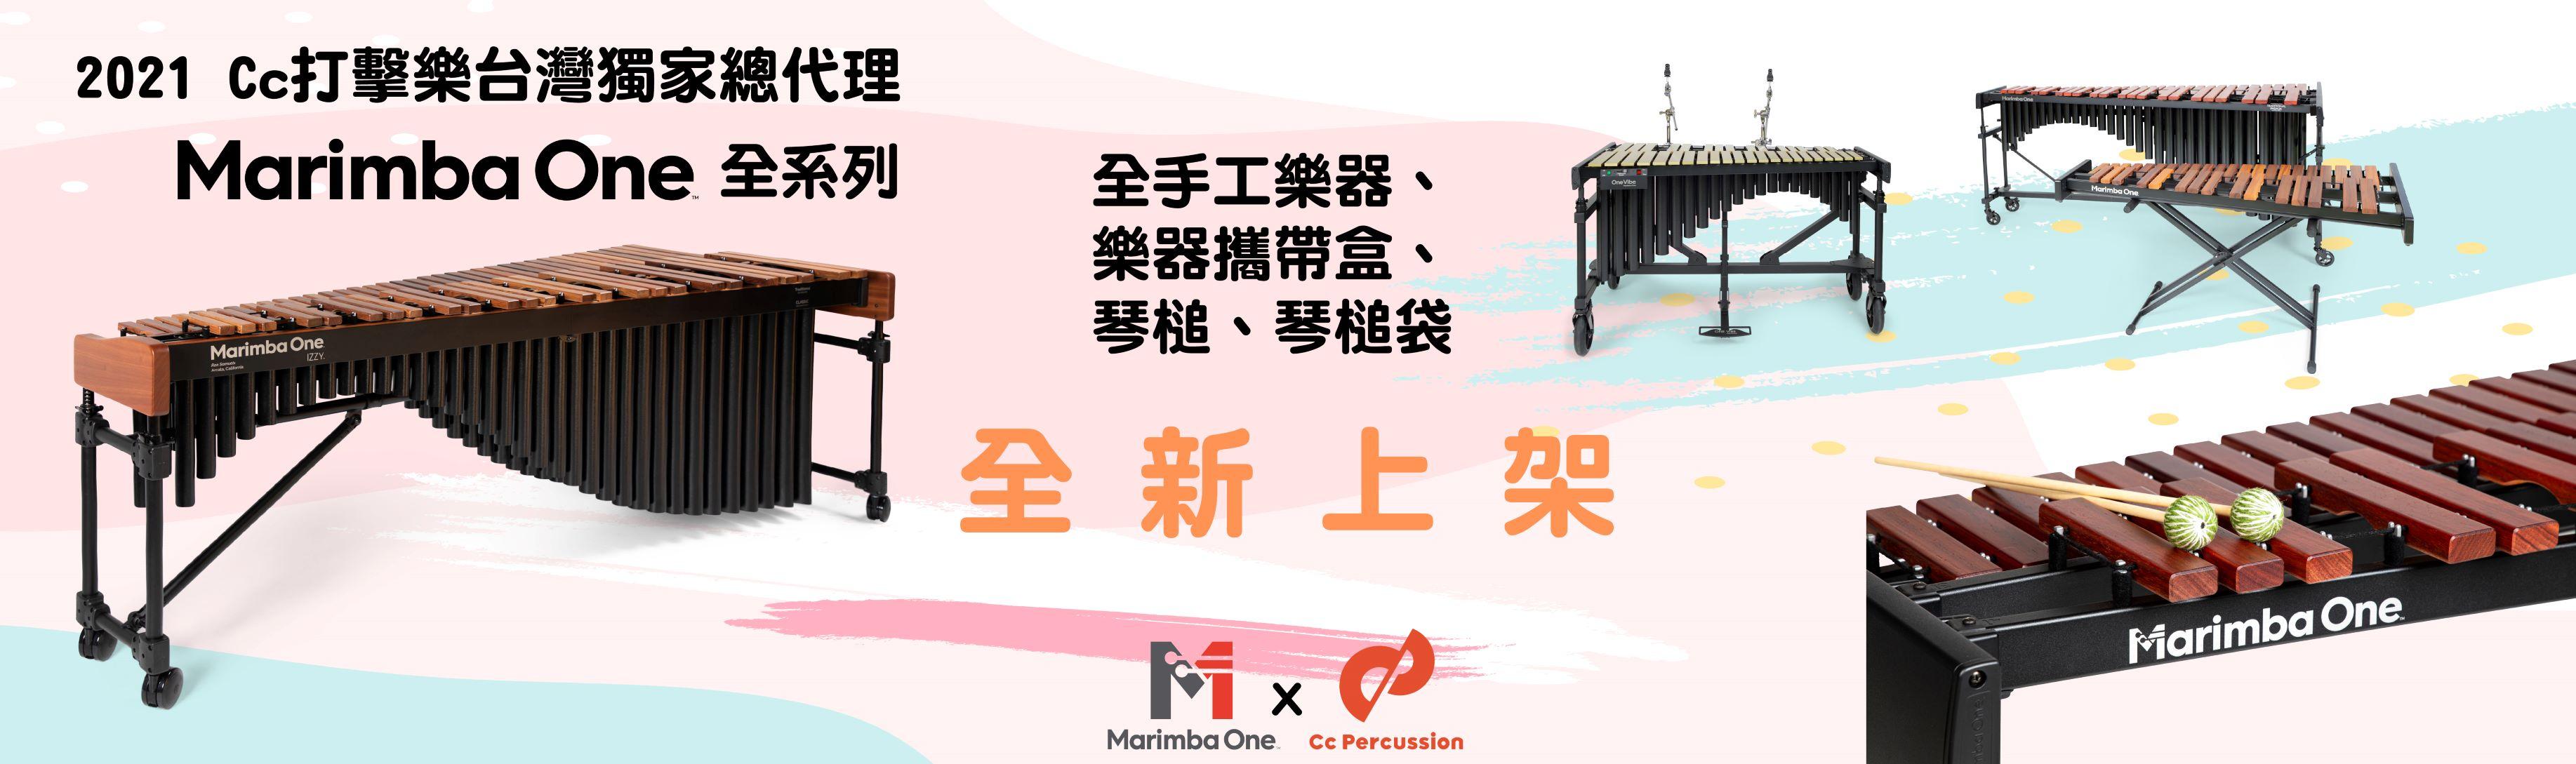 Marimba One 全系列樂器、琴槌、琴槌袋新上架